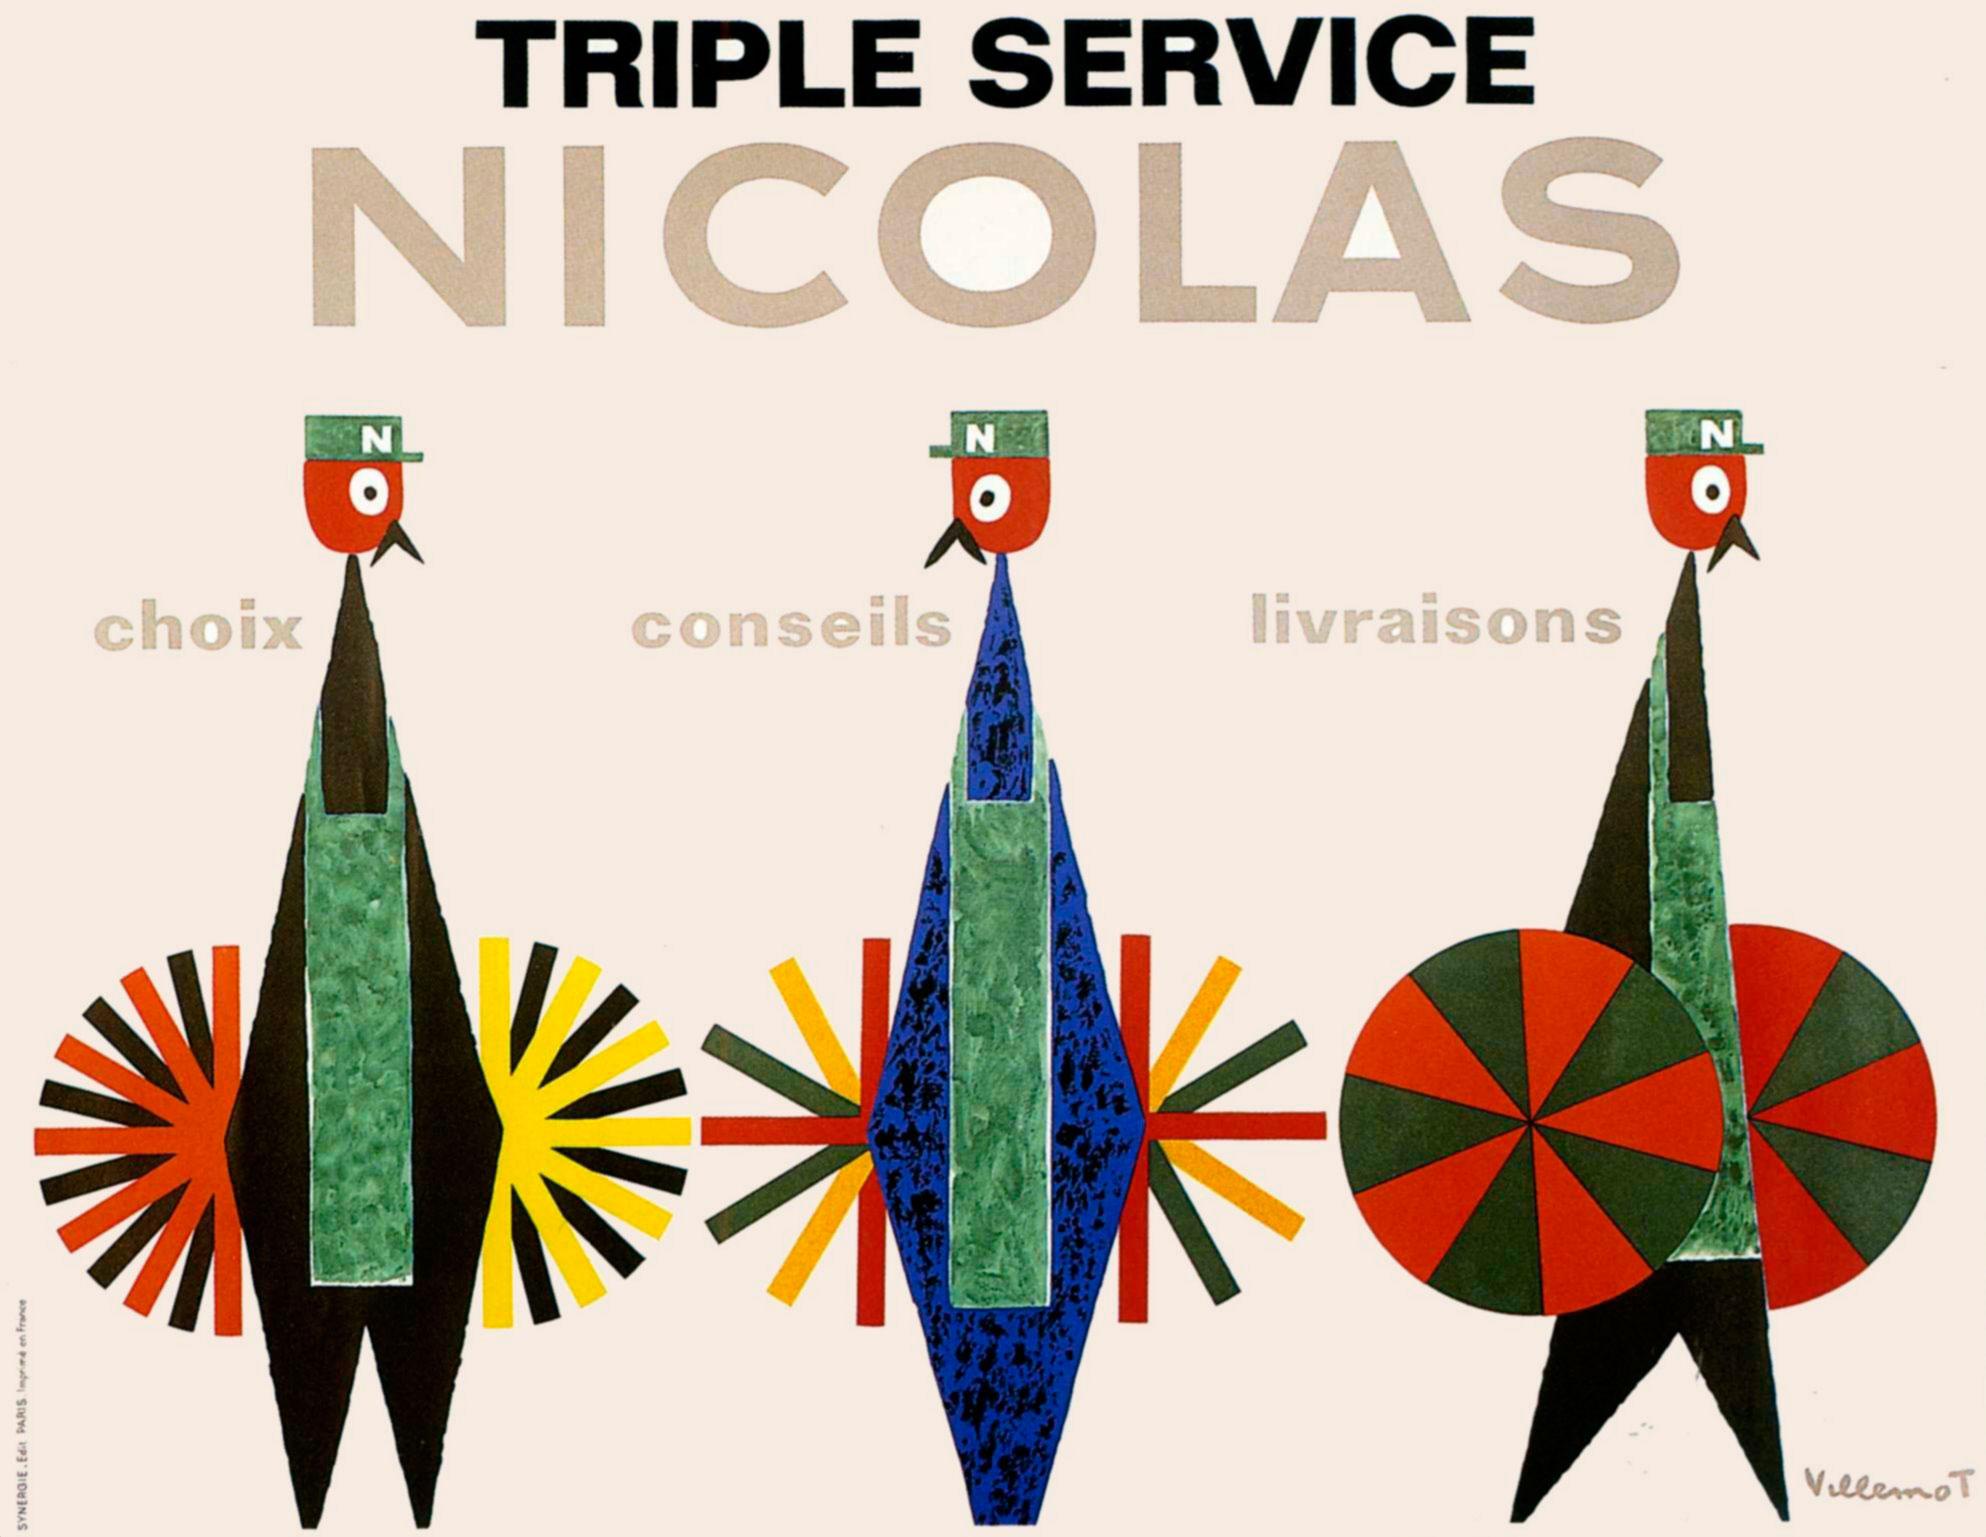 1964-vin-nicolas-triple-service-nectar-villemot-